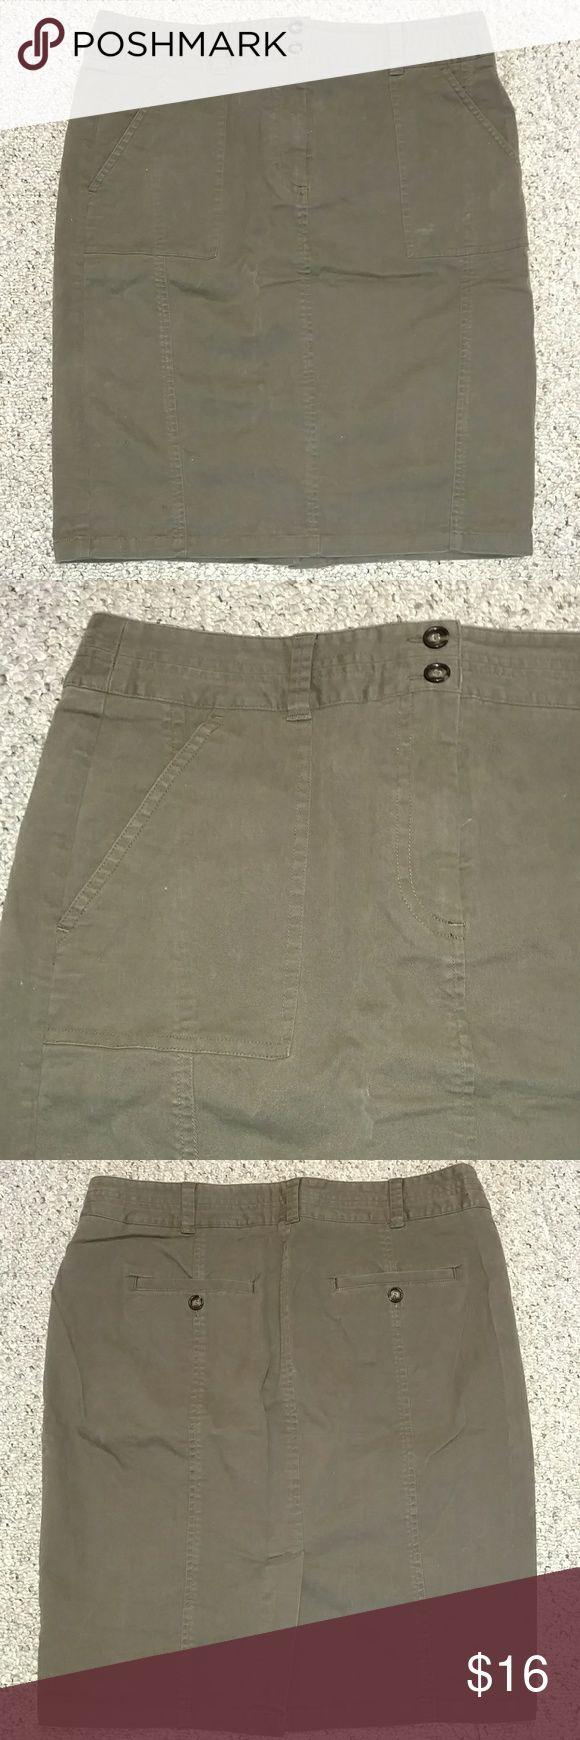 Ann Taylor LOFT milk chocolate khaki pencil skirt 97% cotton, 3 % spandex. Zipper and 2 button front closure. 2 side pockets and 2 back pockets. Rear kick pleat. LOFT Skirts Midi